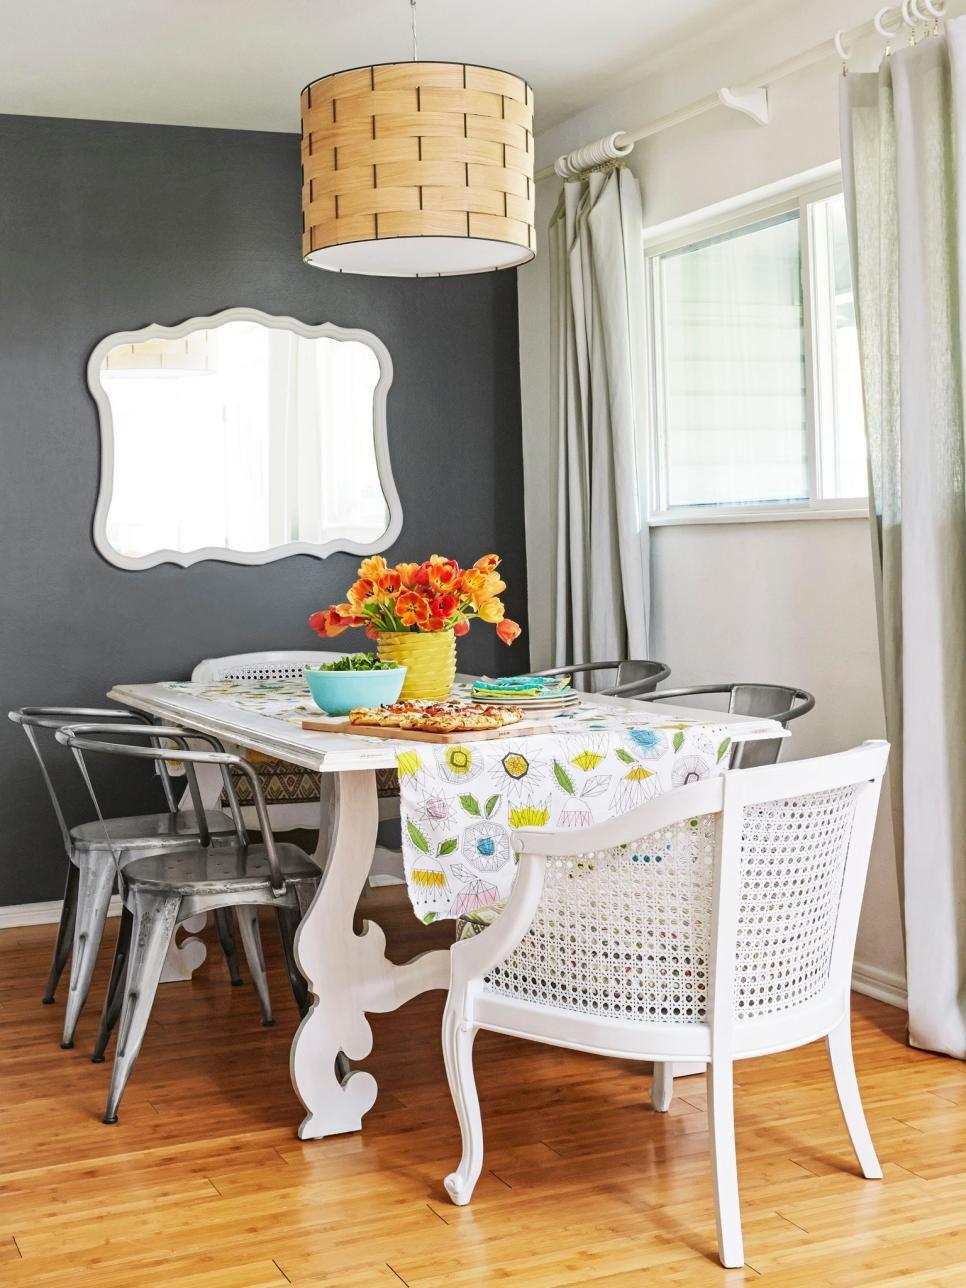 Home Decor On A Budget Fresh Home Decorating Ideas On A Bud